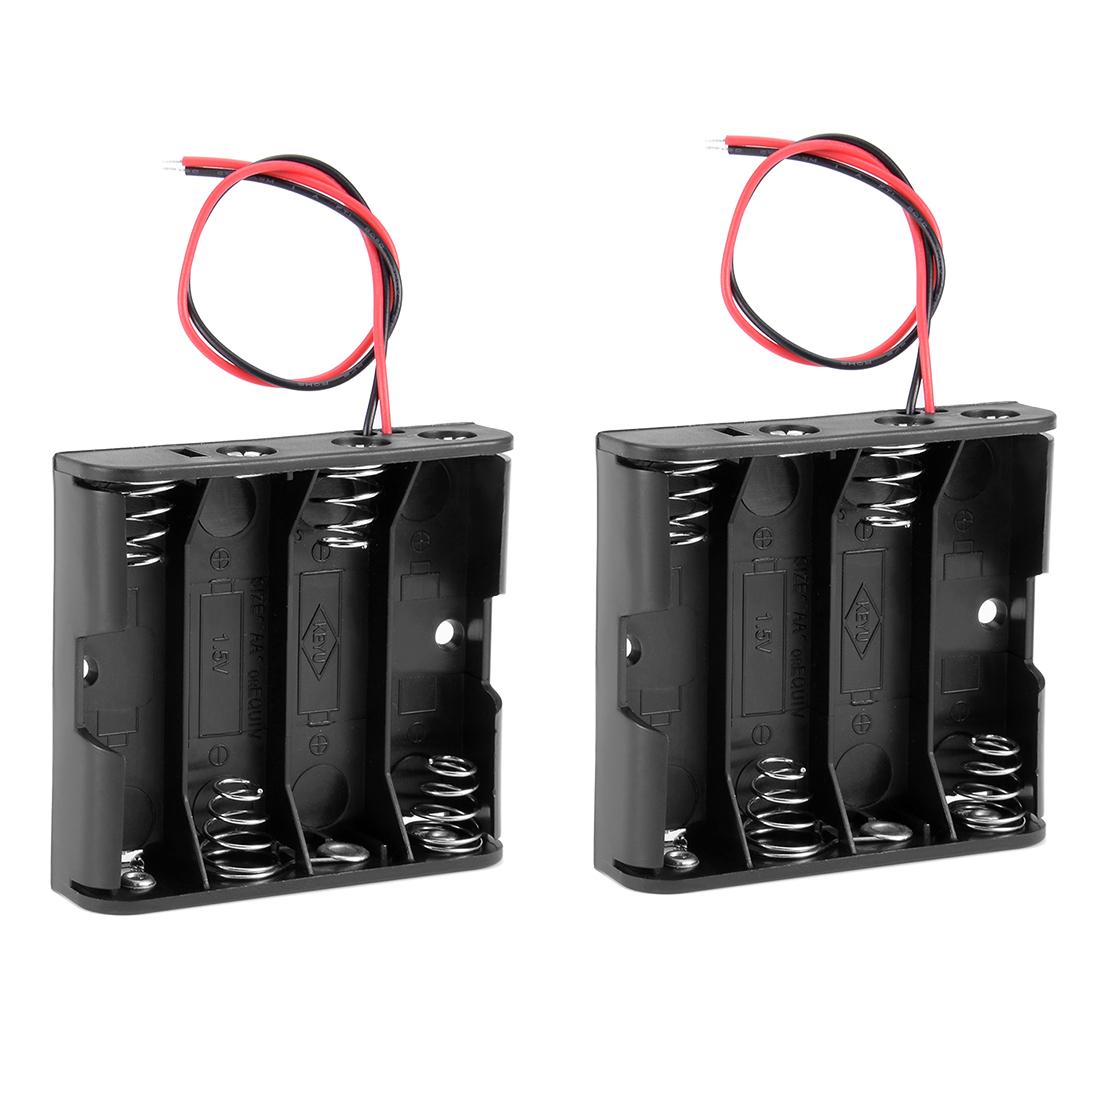 2Pcs Black 4 x 1.5V AA Battery Holder Storage Case Box w Wire Leads